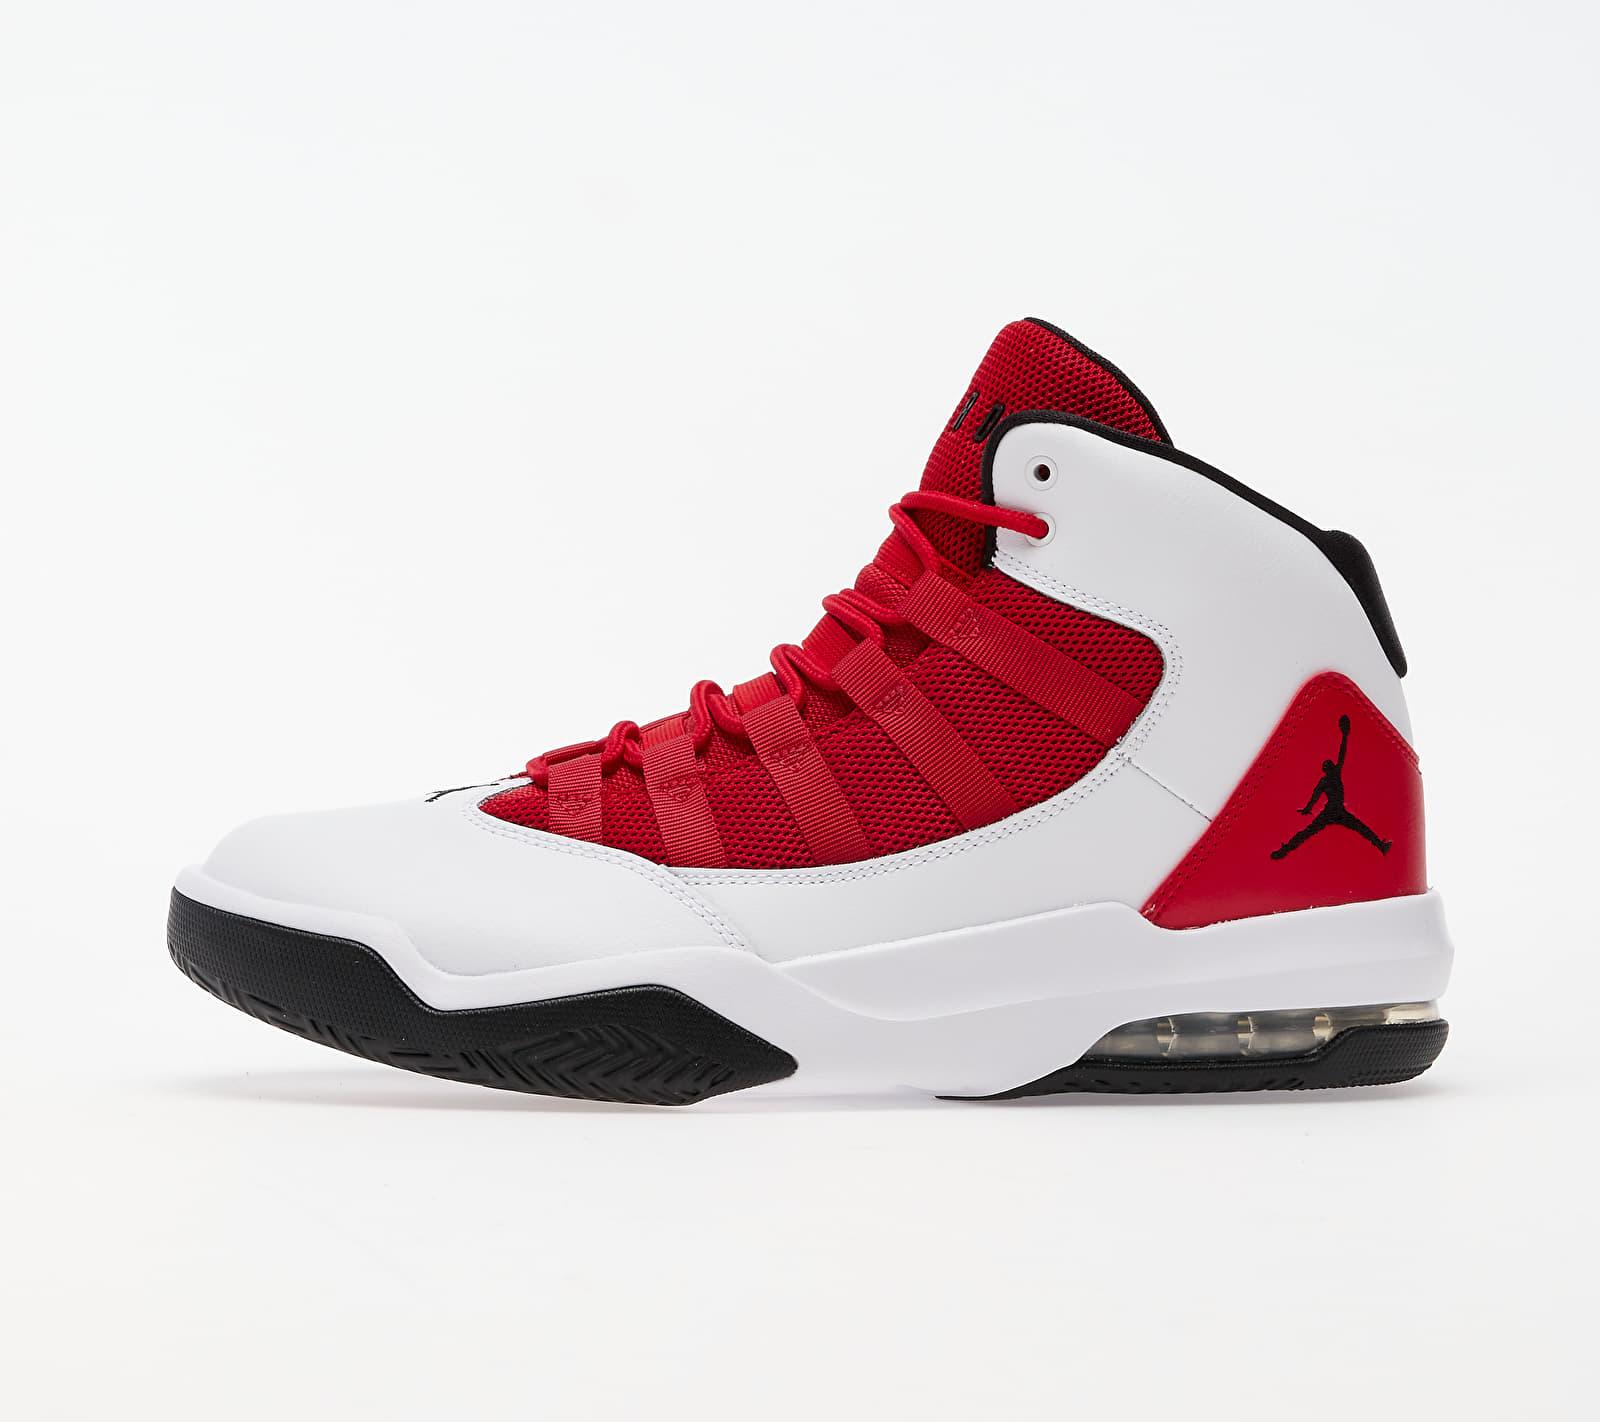 Jordan Max Aura White/ Black-Gym Red EUR 46